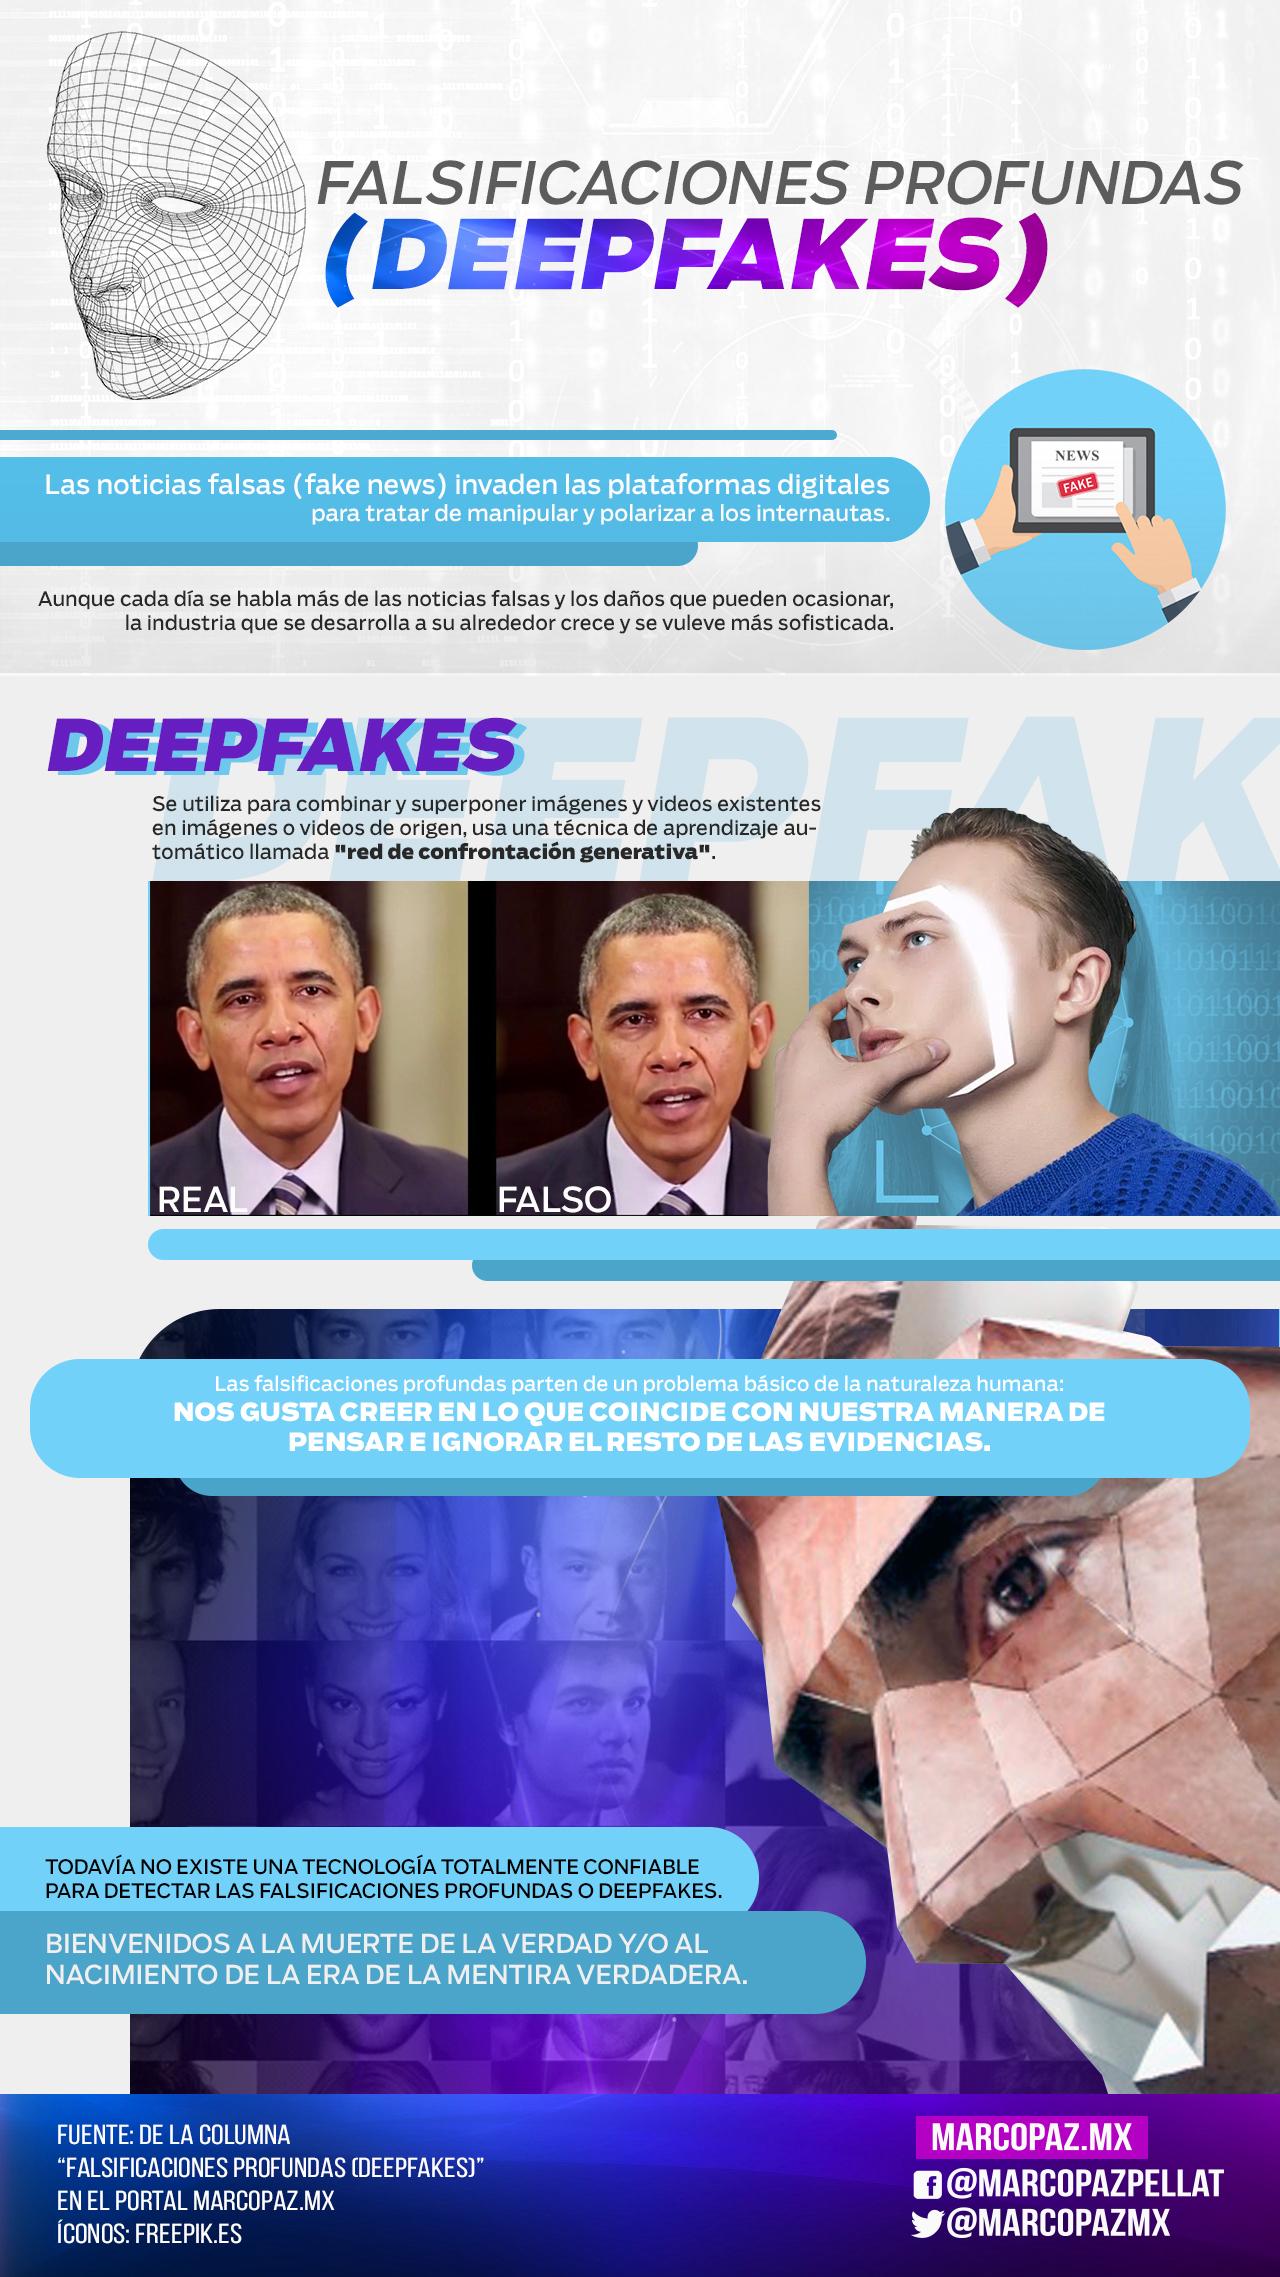 103_INFOGRAFIA_ Falsificaciones profundas deepfakes copy